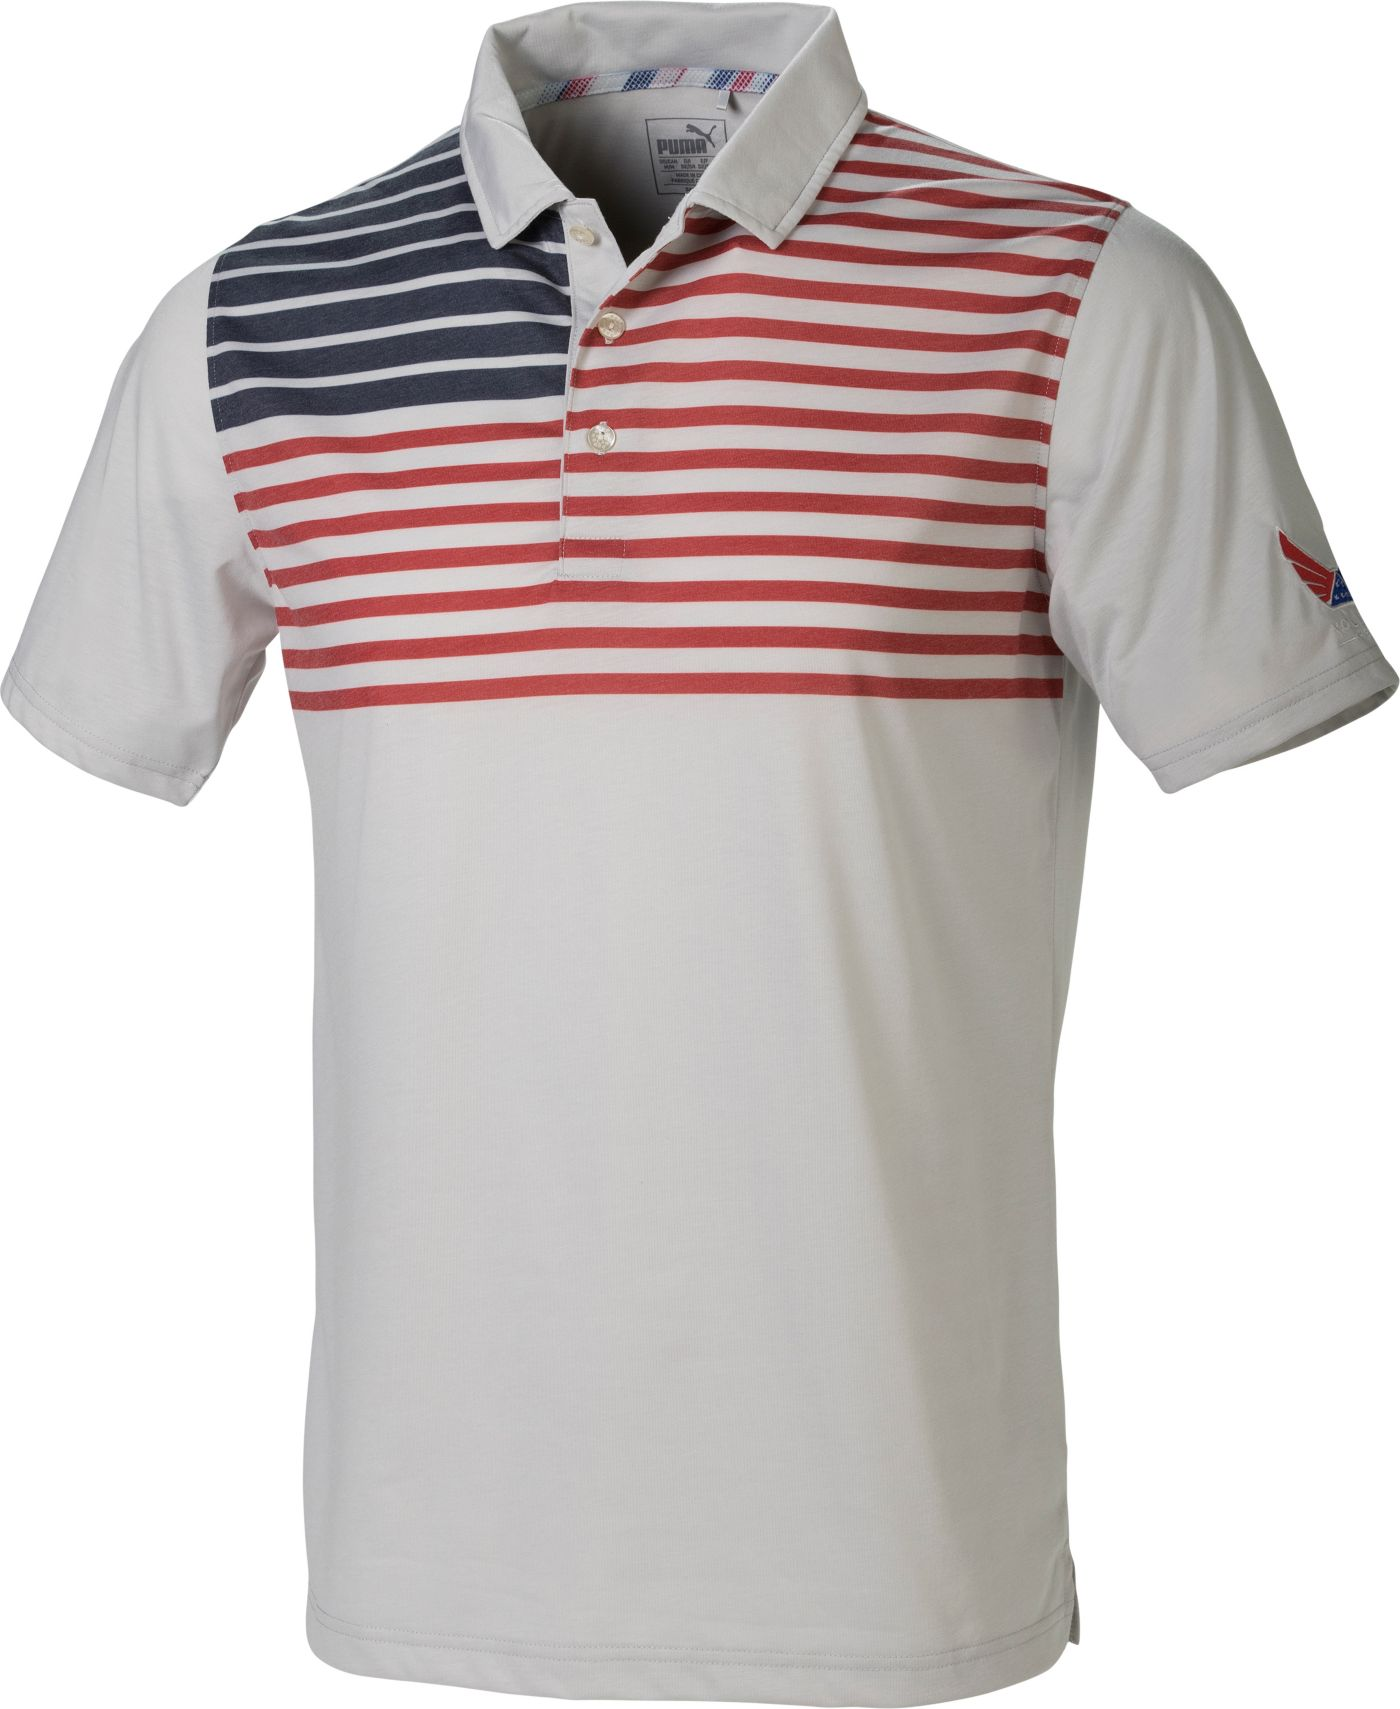 PUMA Men's Volition Patriot Golf Polo